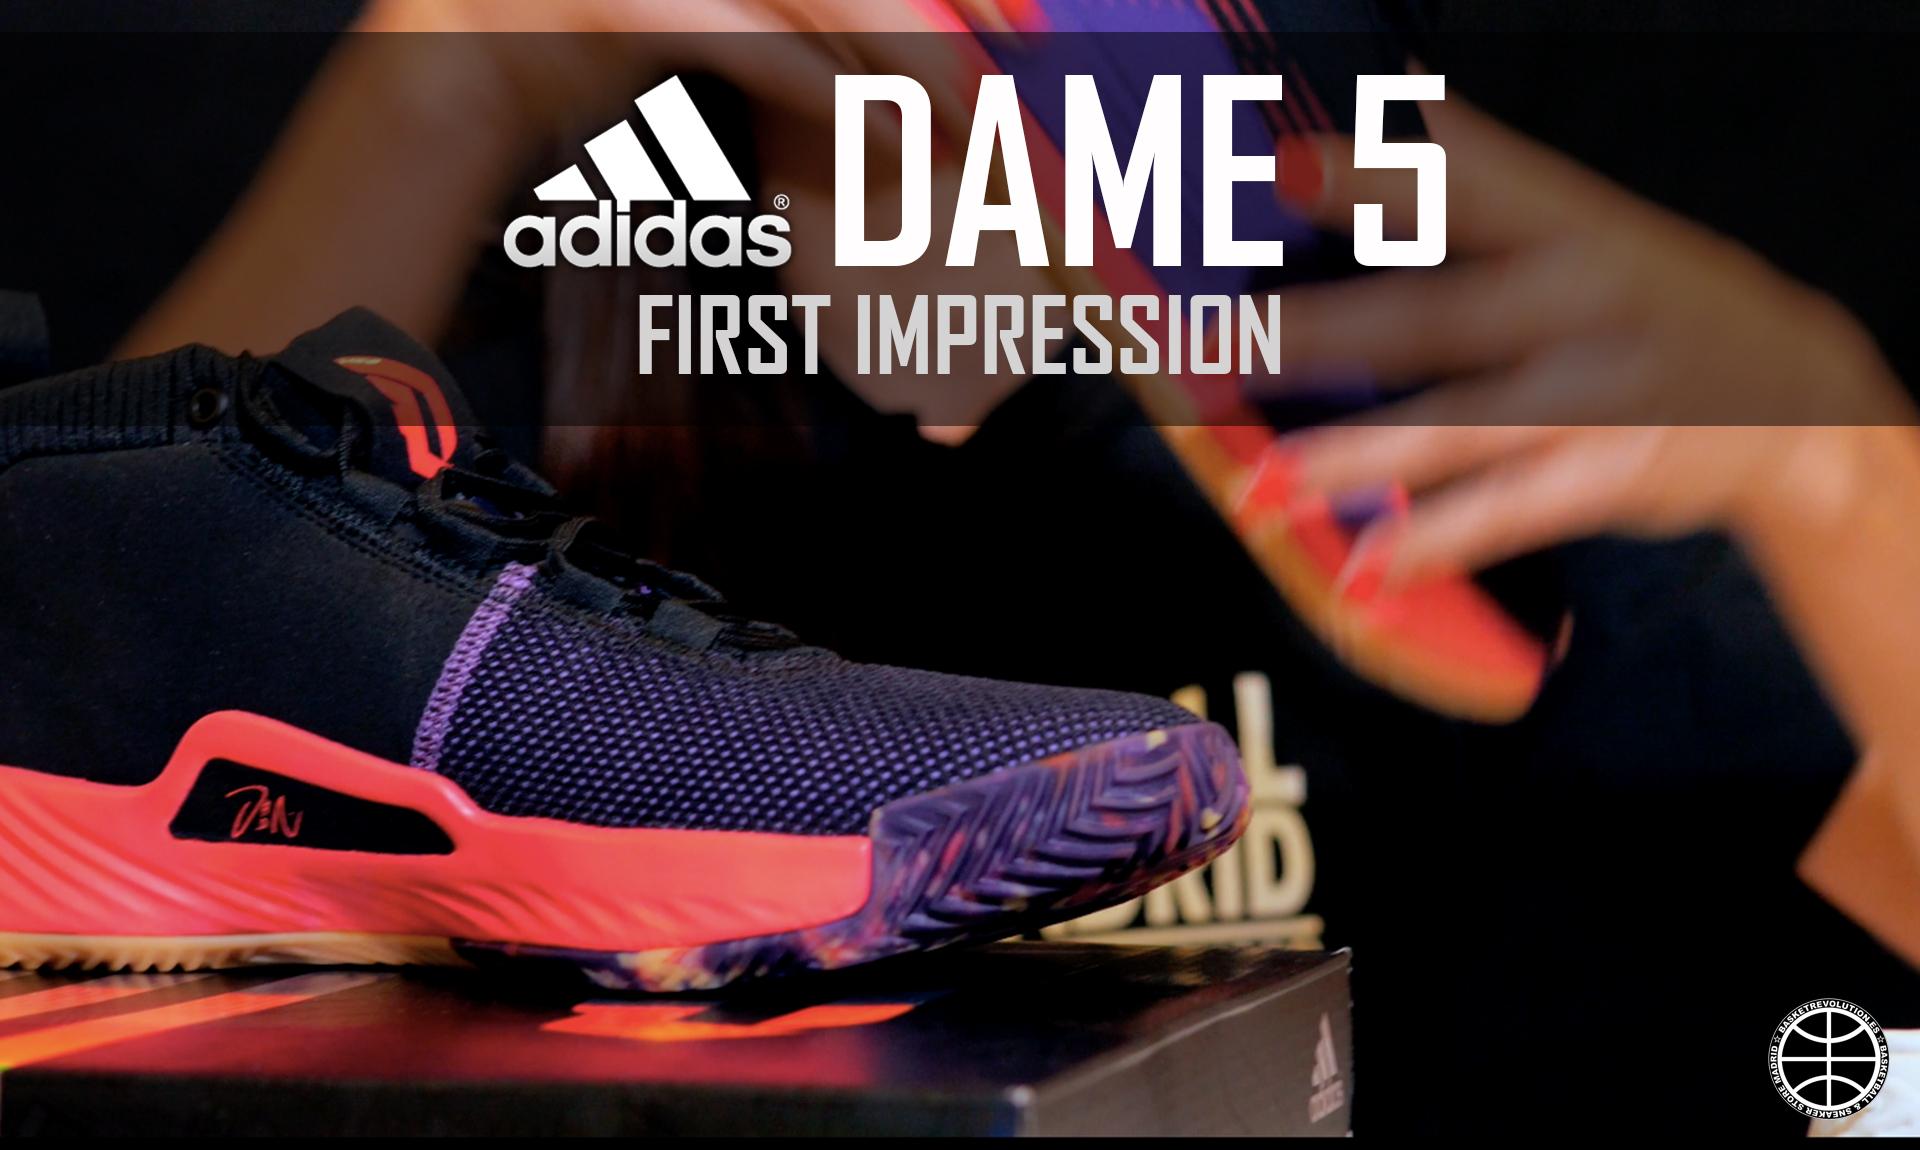 Revolution Basket Dame Adidas 5 Impression – First O0PXNn8wk